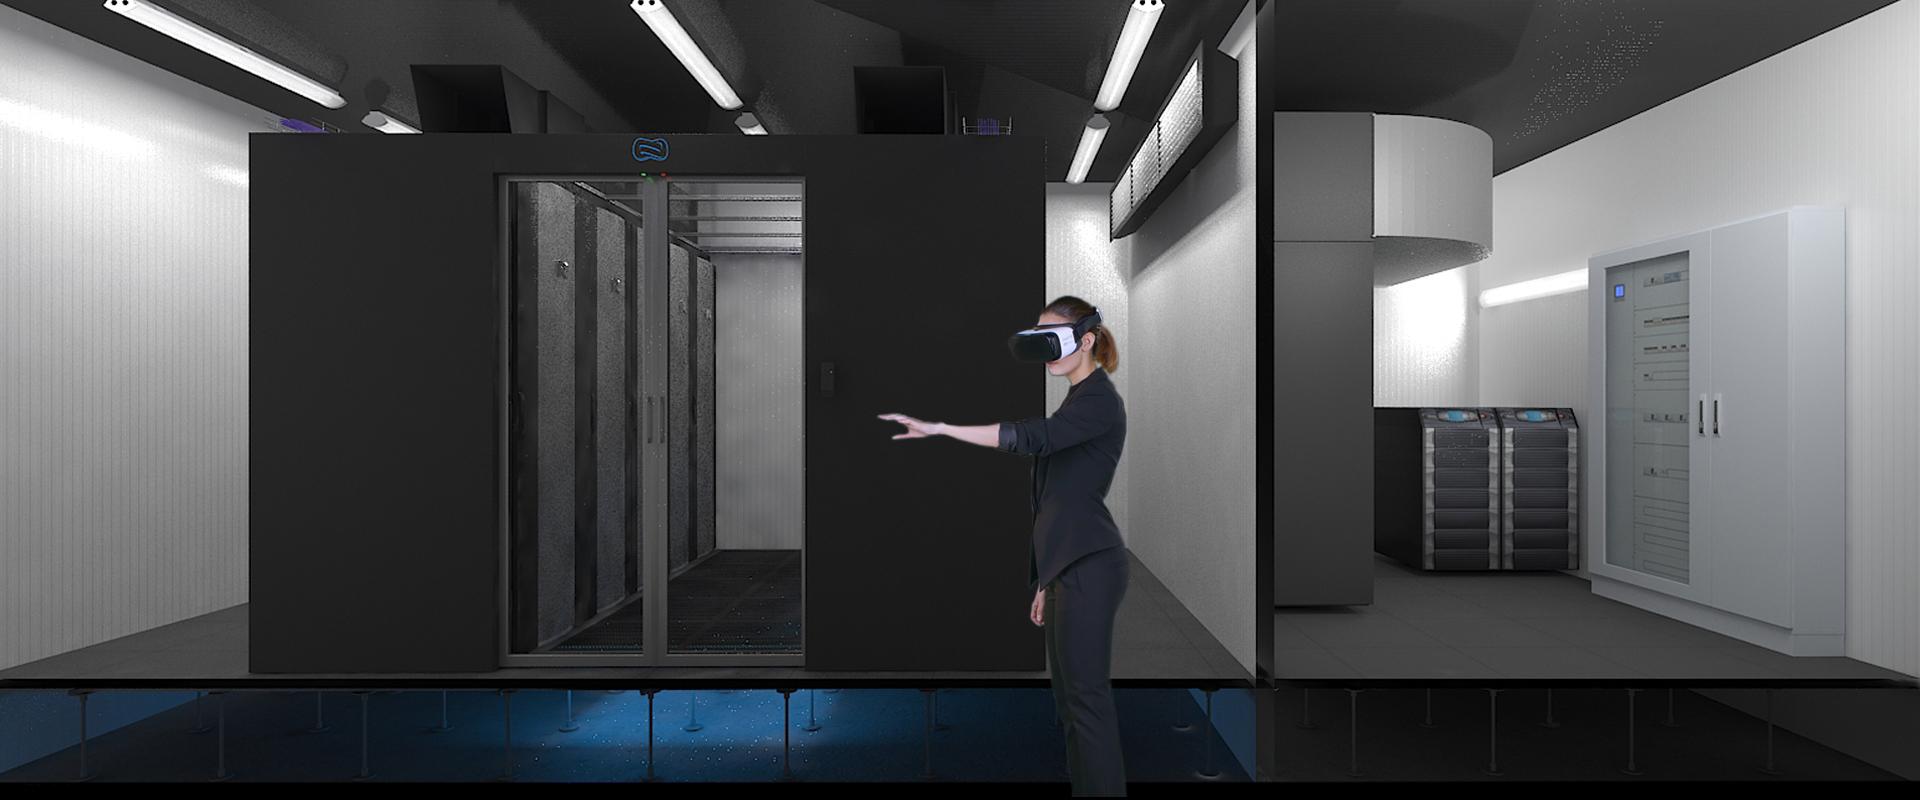 realidad virtual cpd